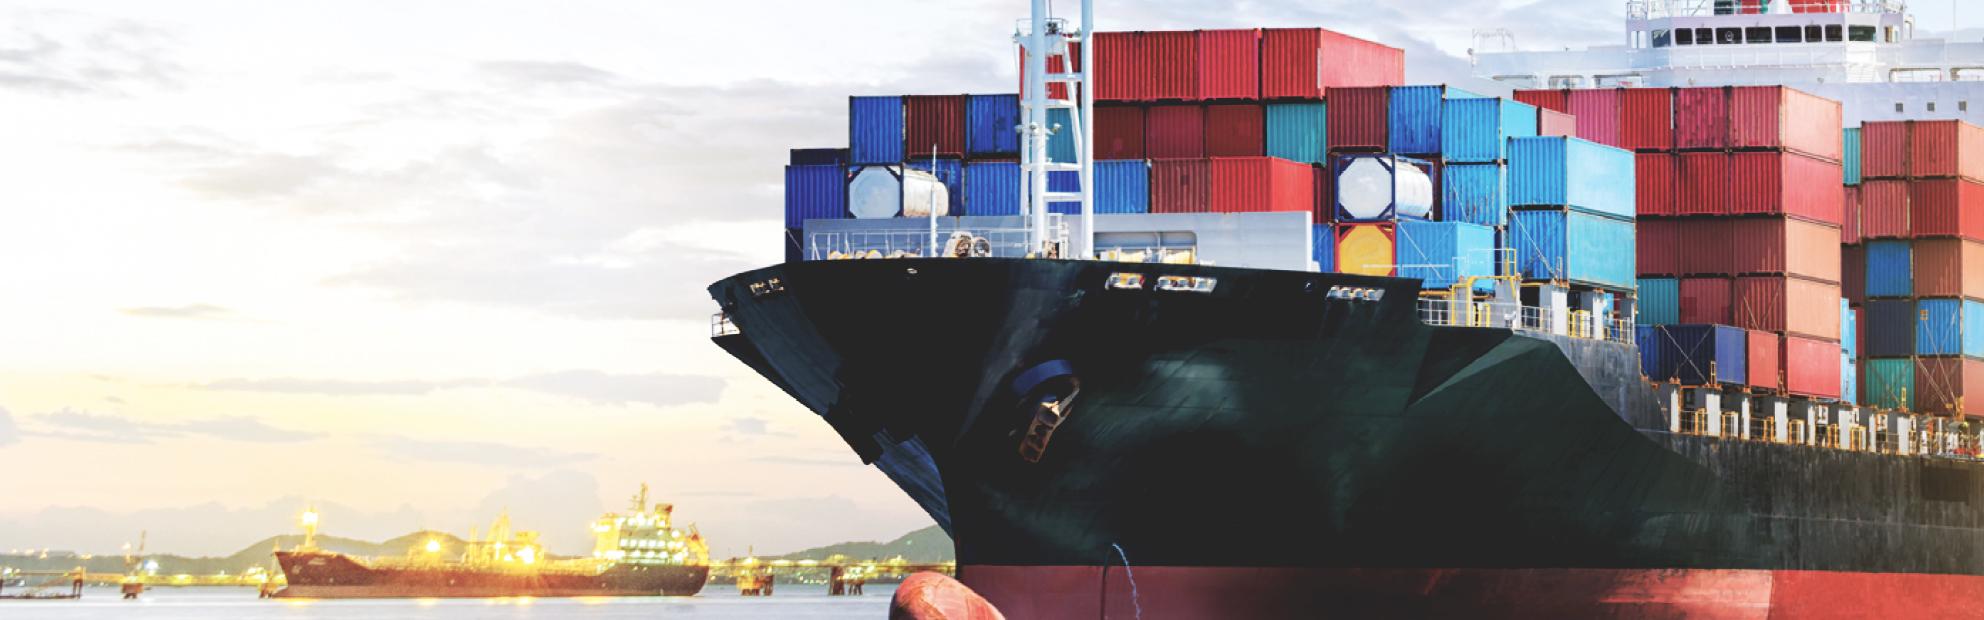 Страхование грузов и грузоперевозок